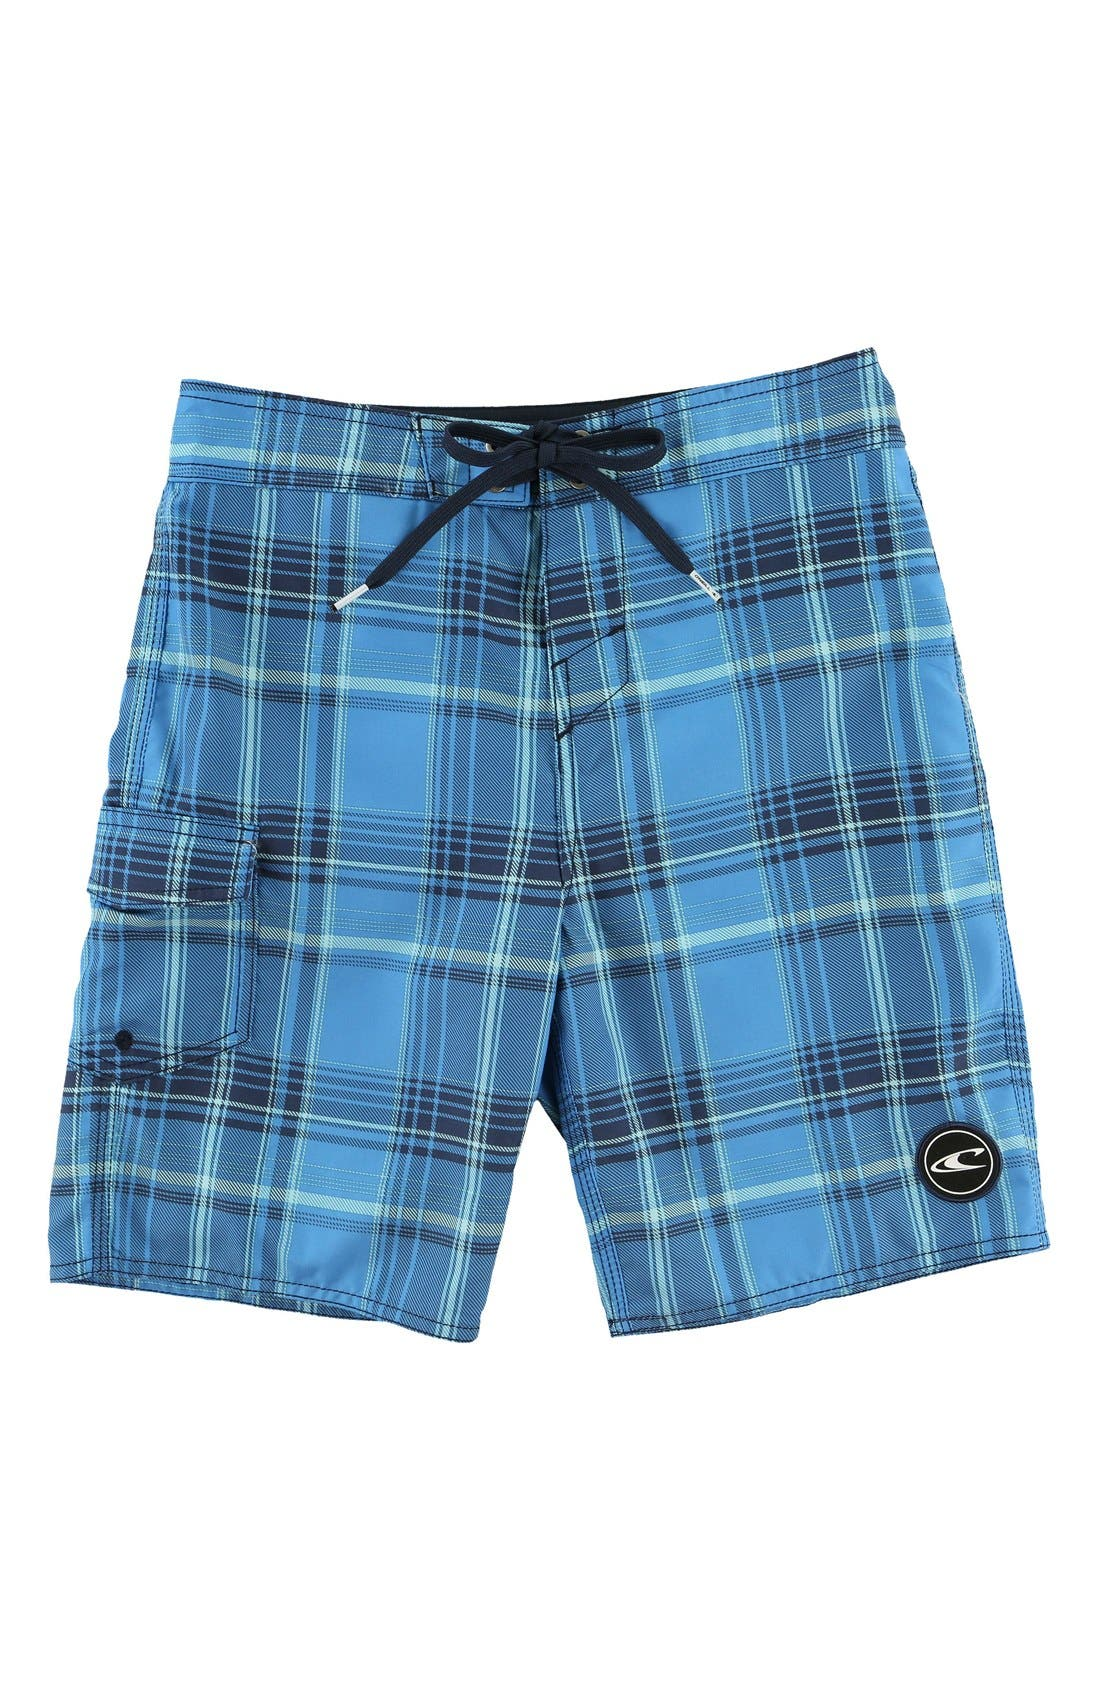 Alternate Image 1 Selected - O'Neill Santa Cruz Plaid Board Shorts (Big Boys)